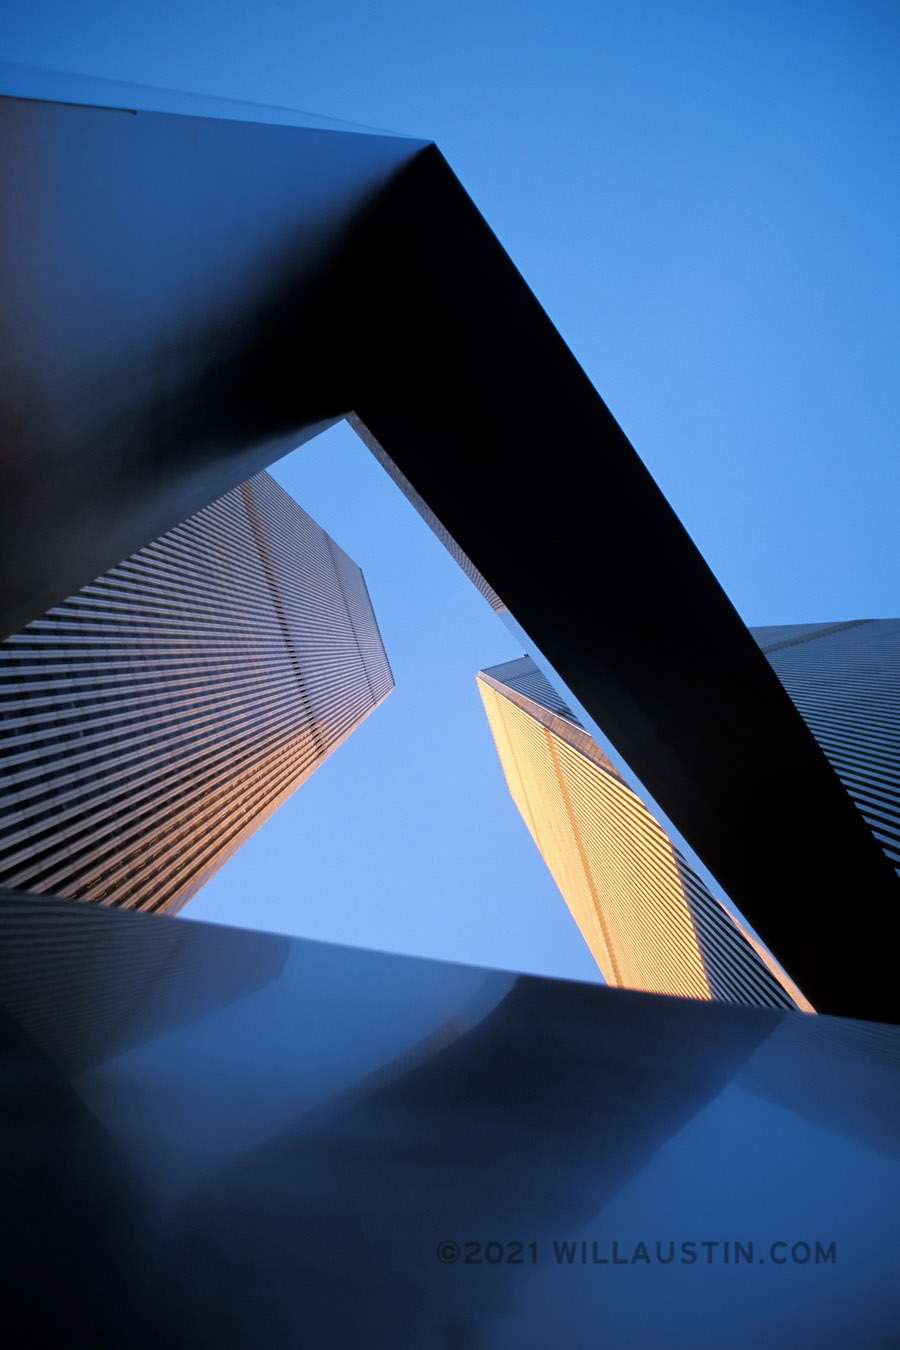 World Trade Center, Manhattan, New York City, New York, USA